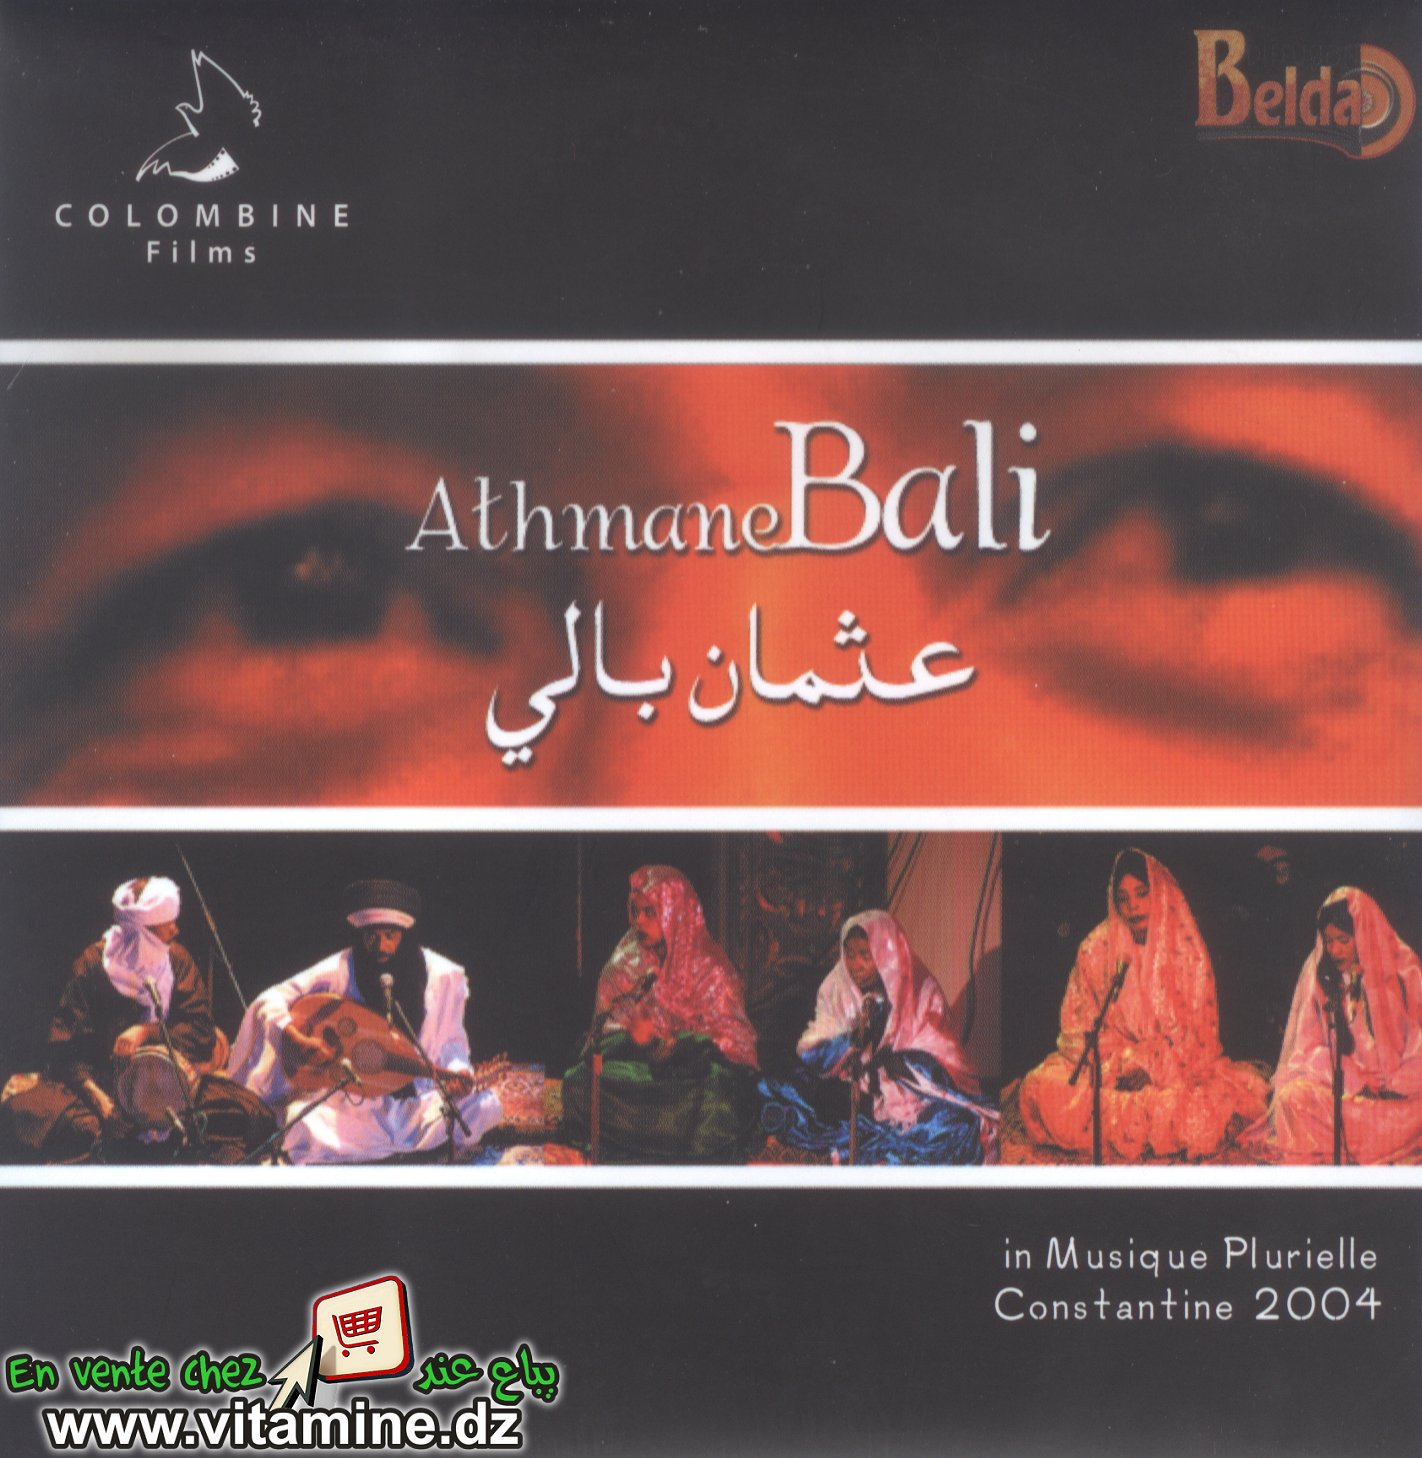 Athmane Bali - compilation